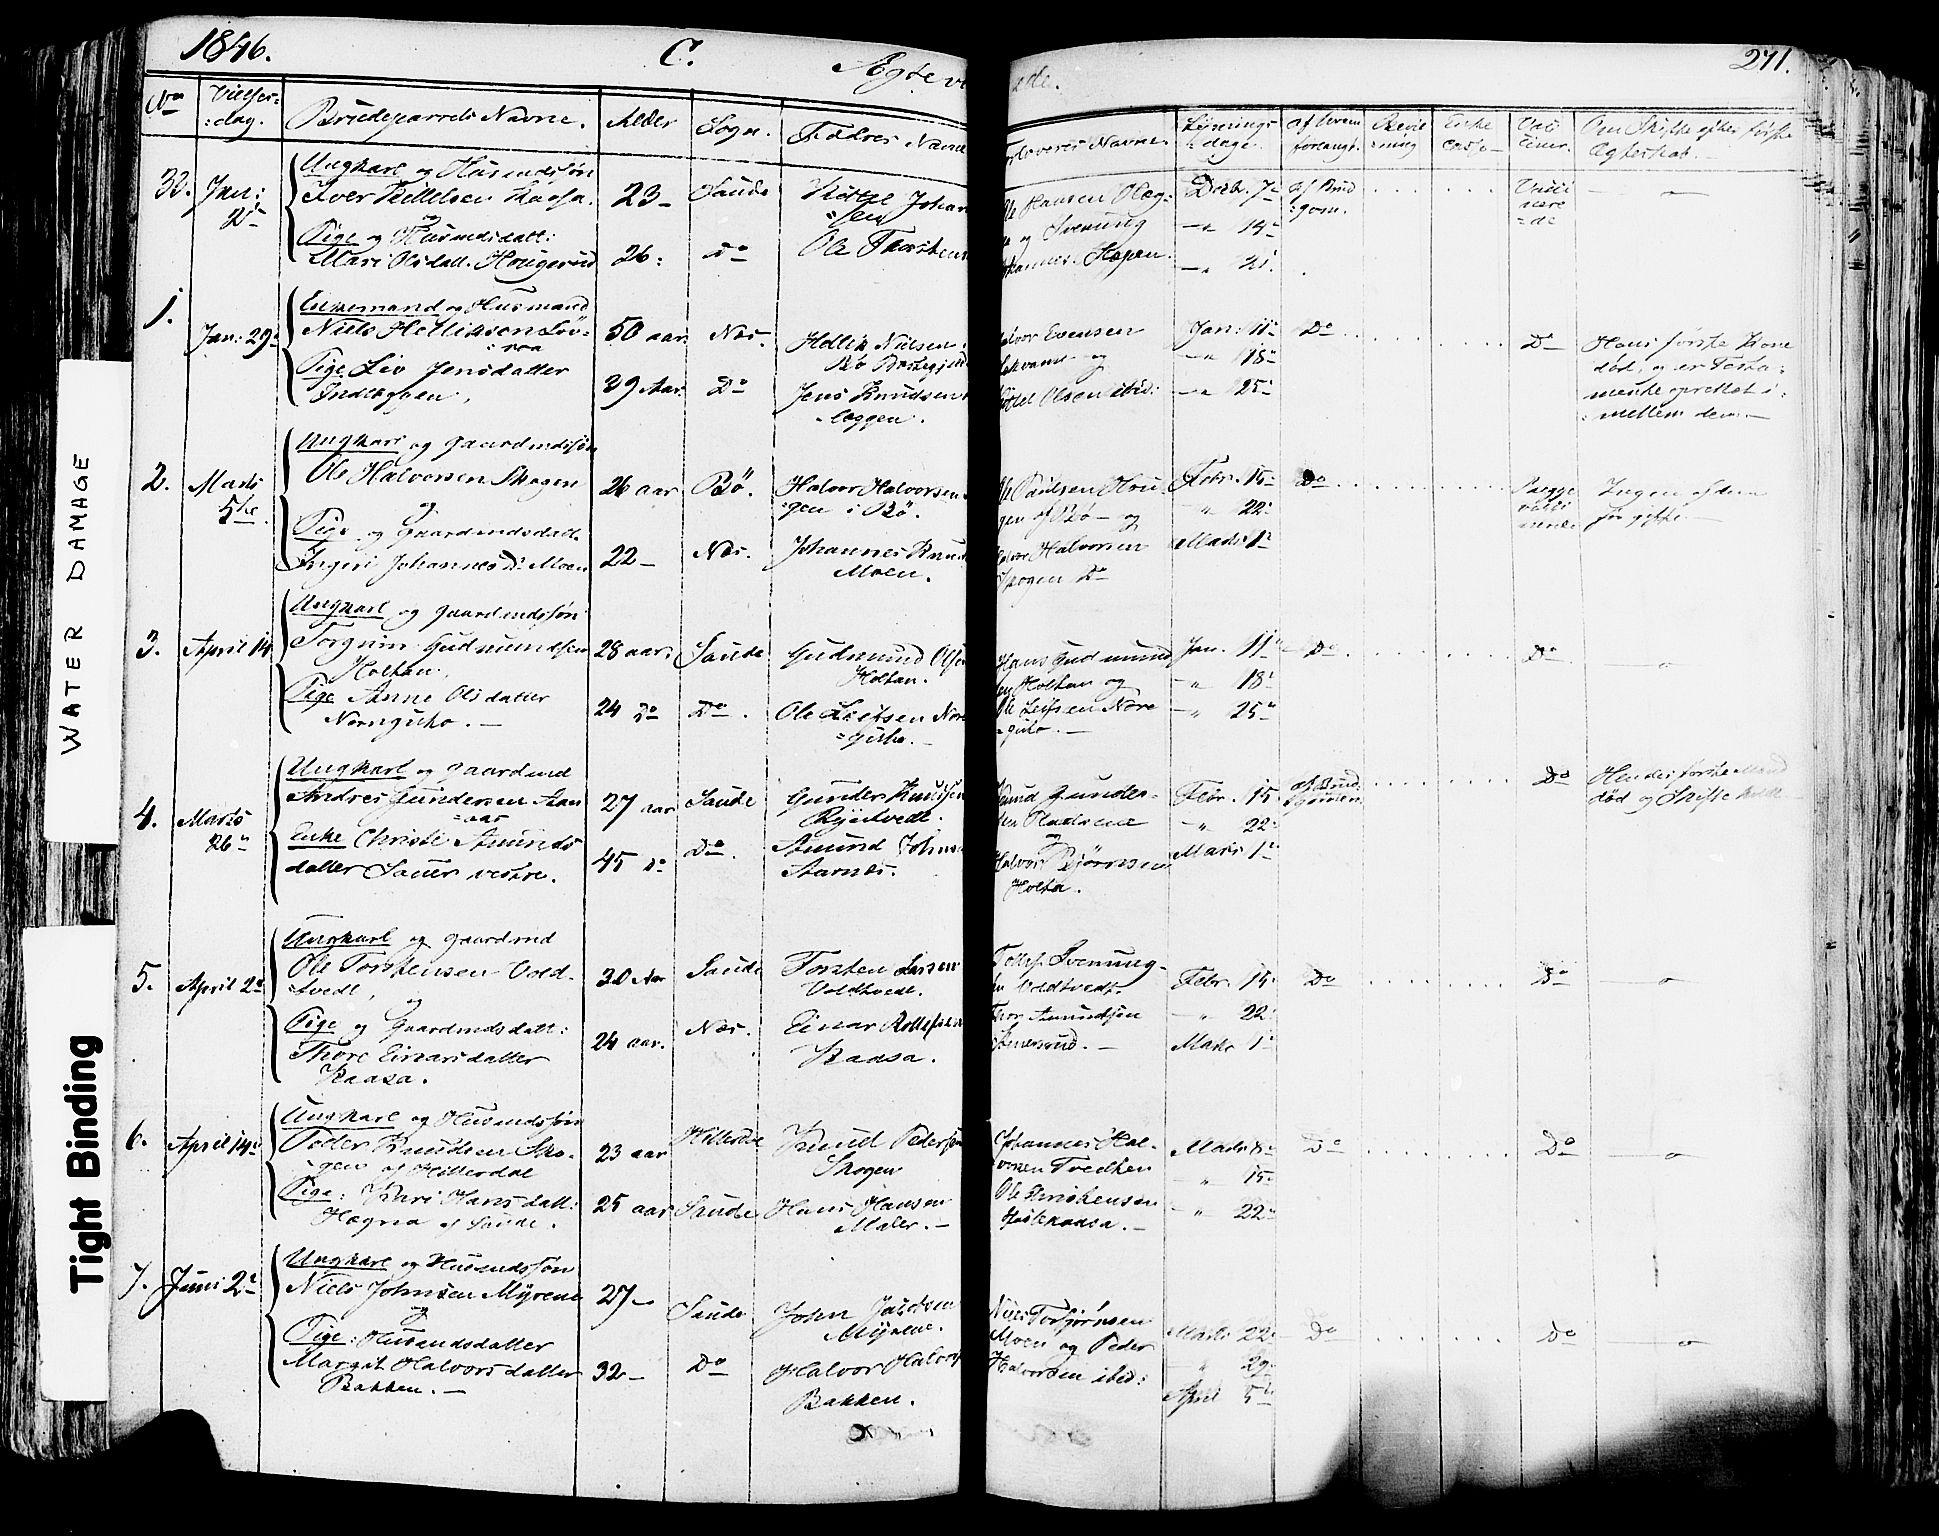 SAKO, Sauherad kirkebøker, F/Fa/L0006: Ministerialbok nr. I 6, 1827-1850, s. 271